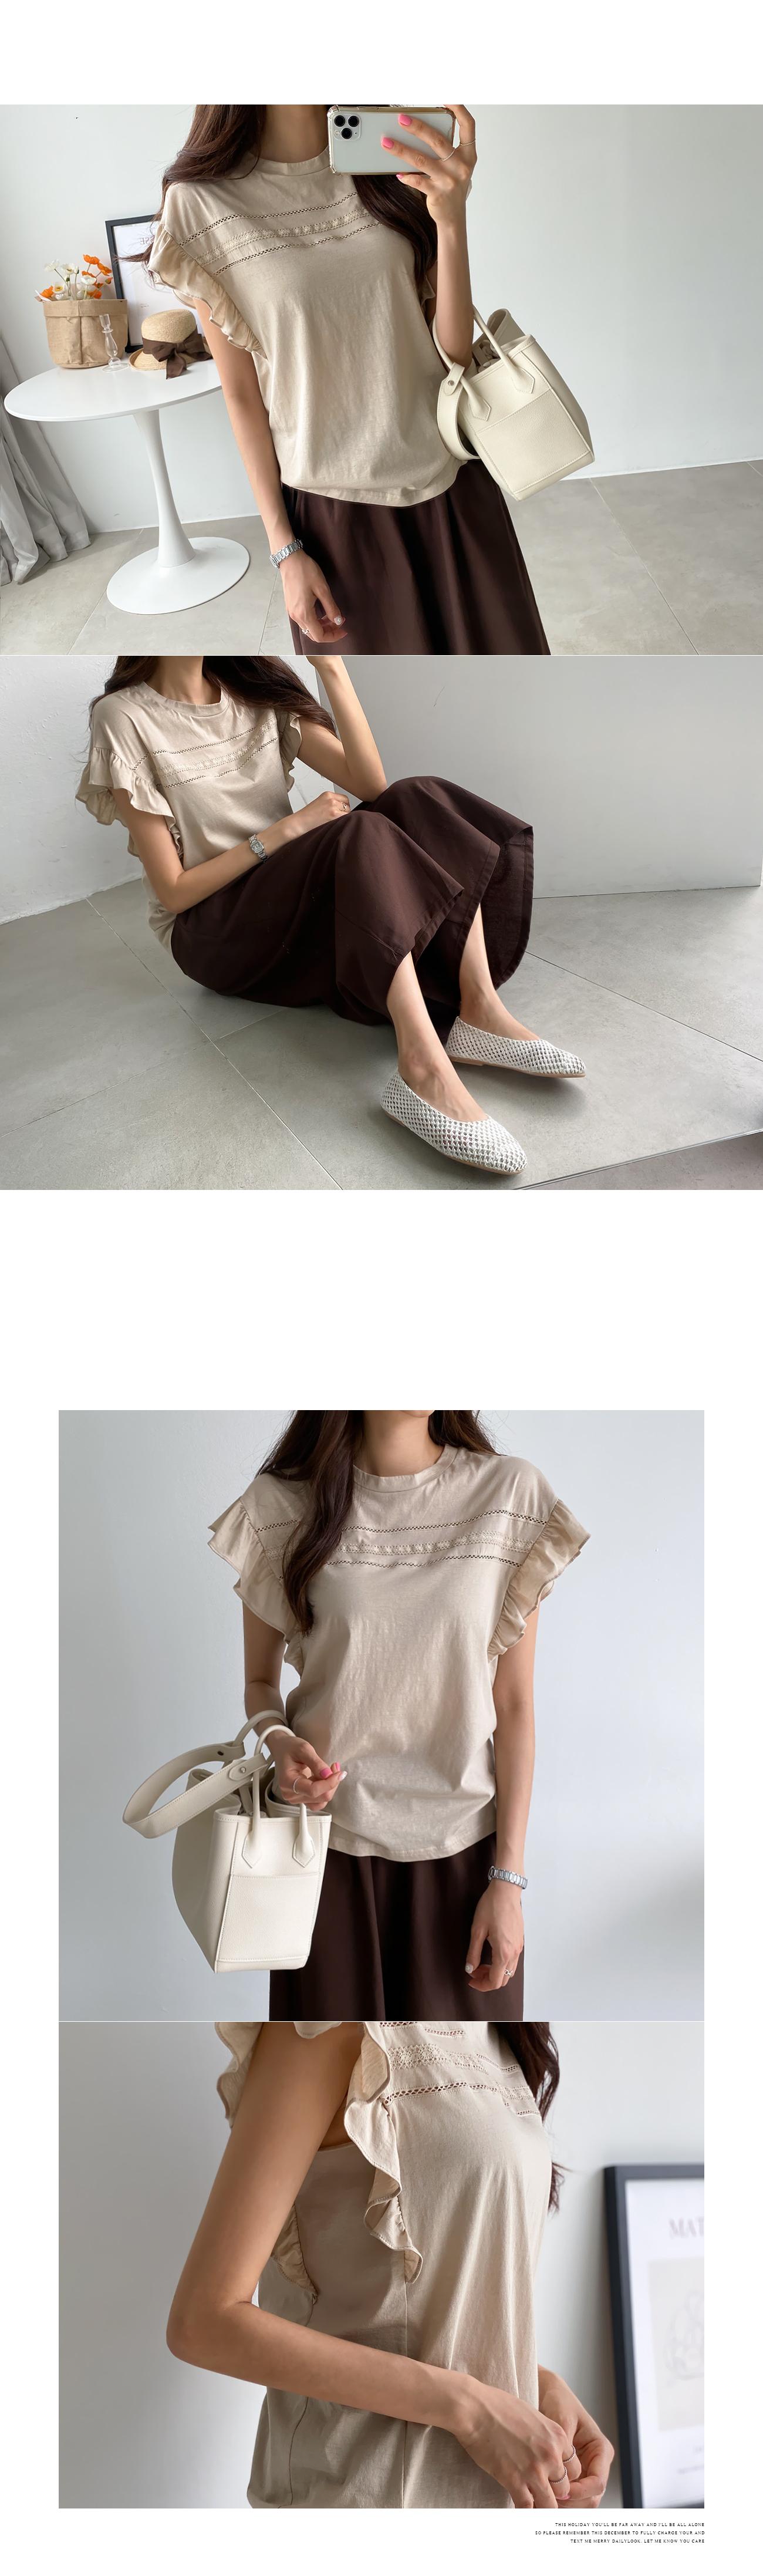 Angel frill t-shirt #108251